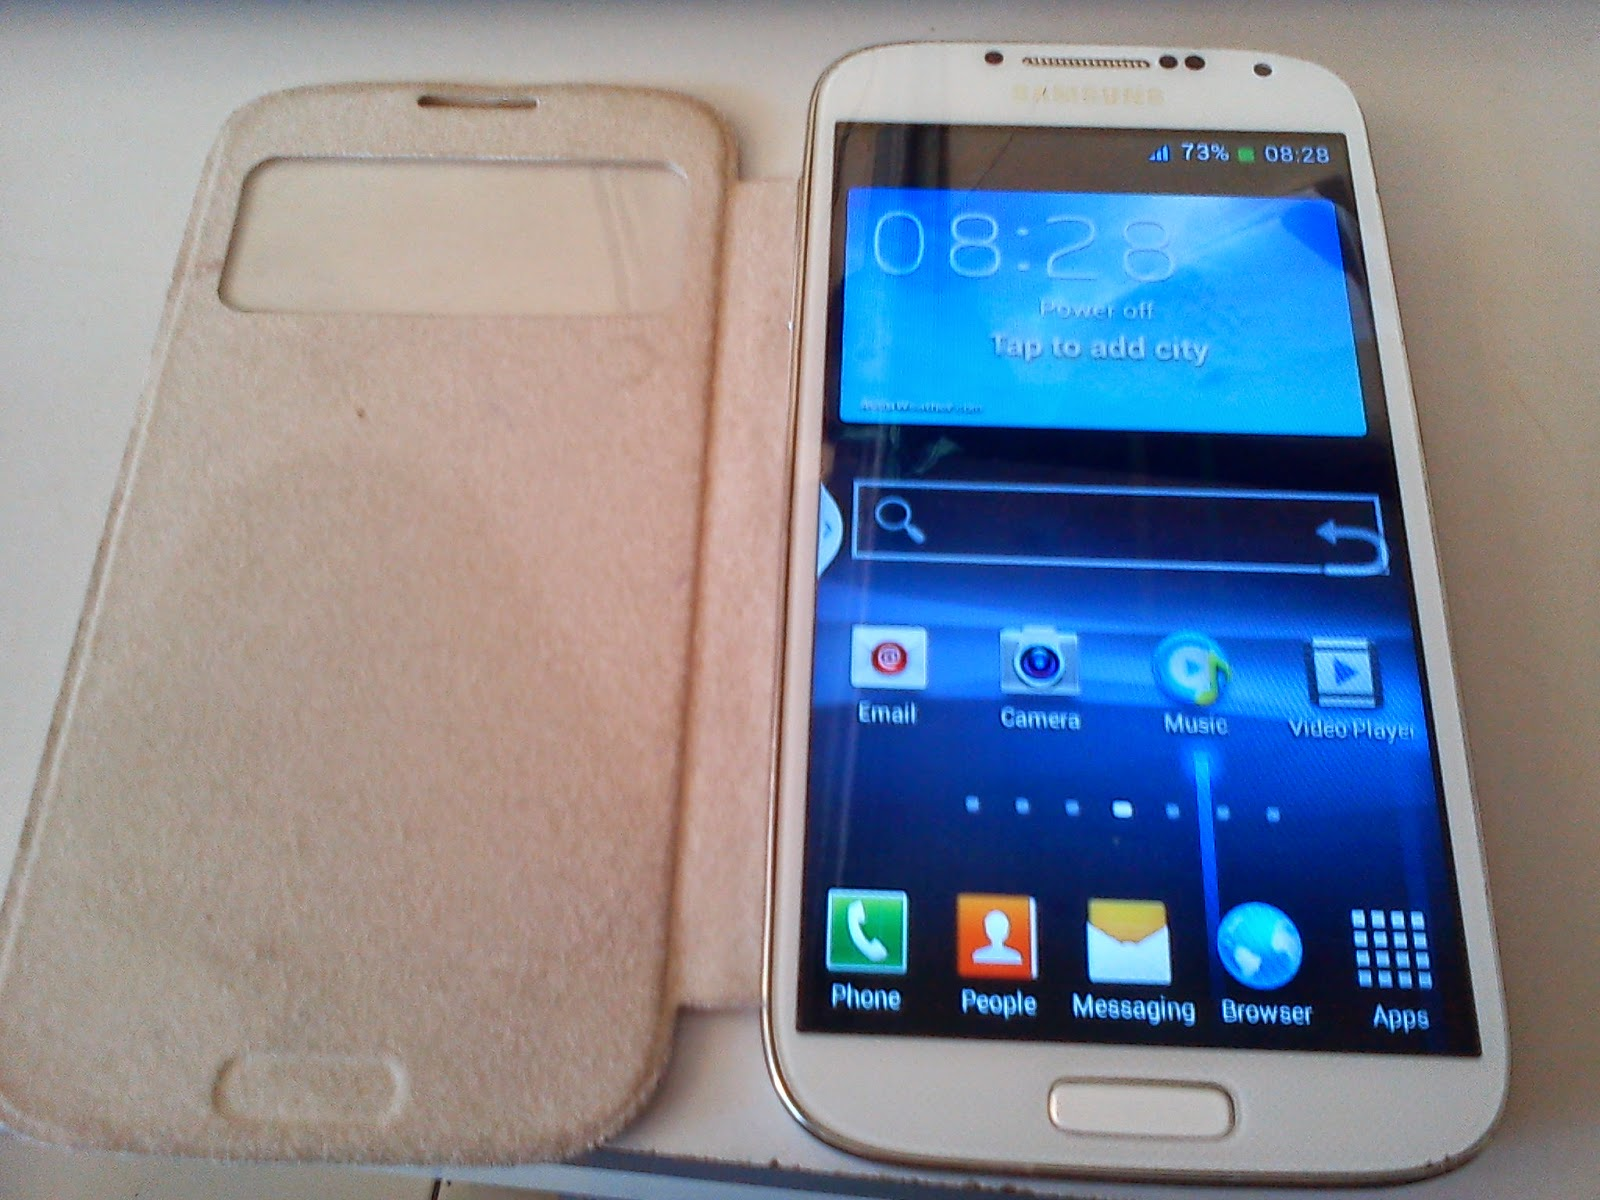 Contoh Kerusakan Samsung Galaxy S4